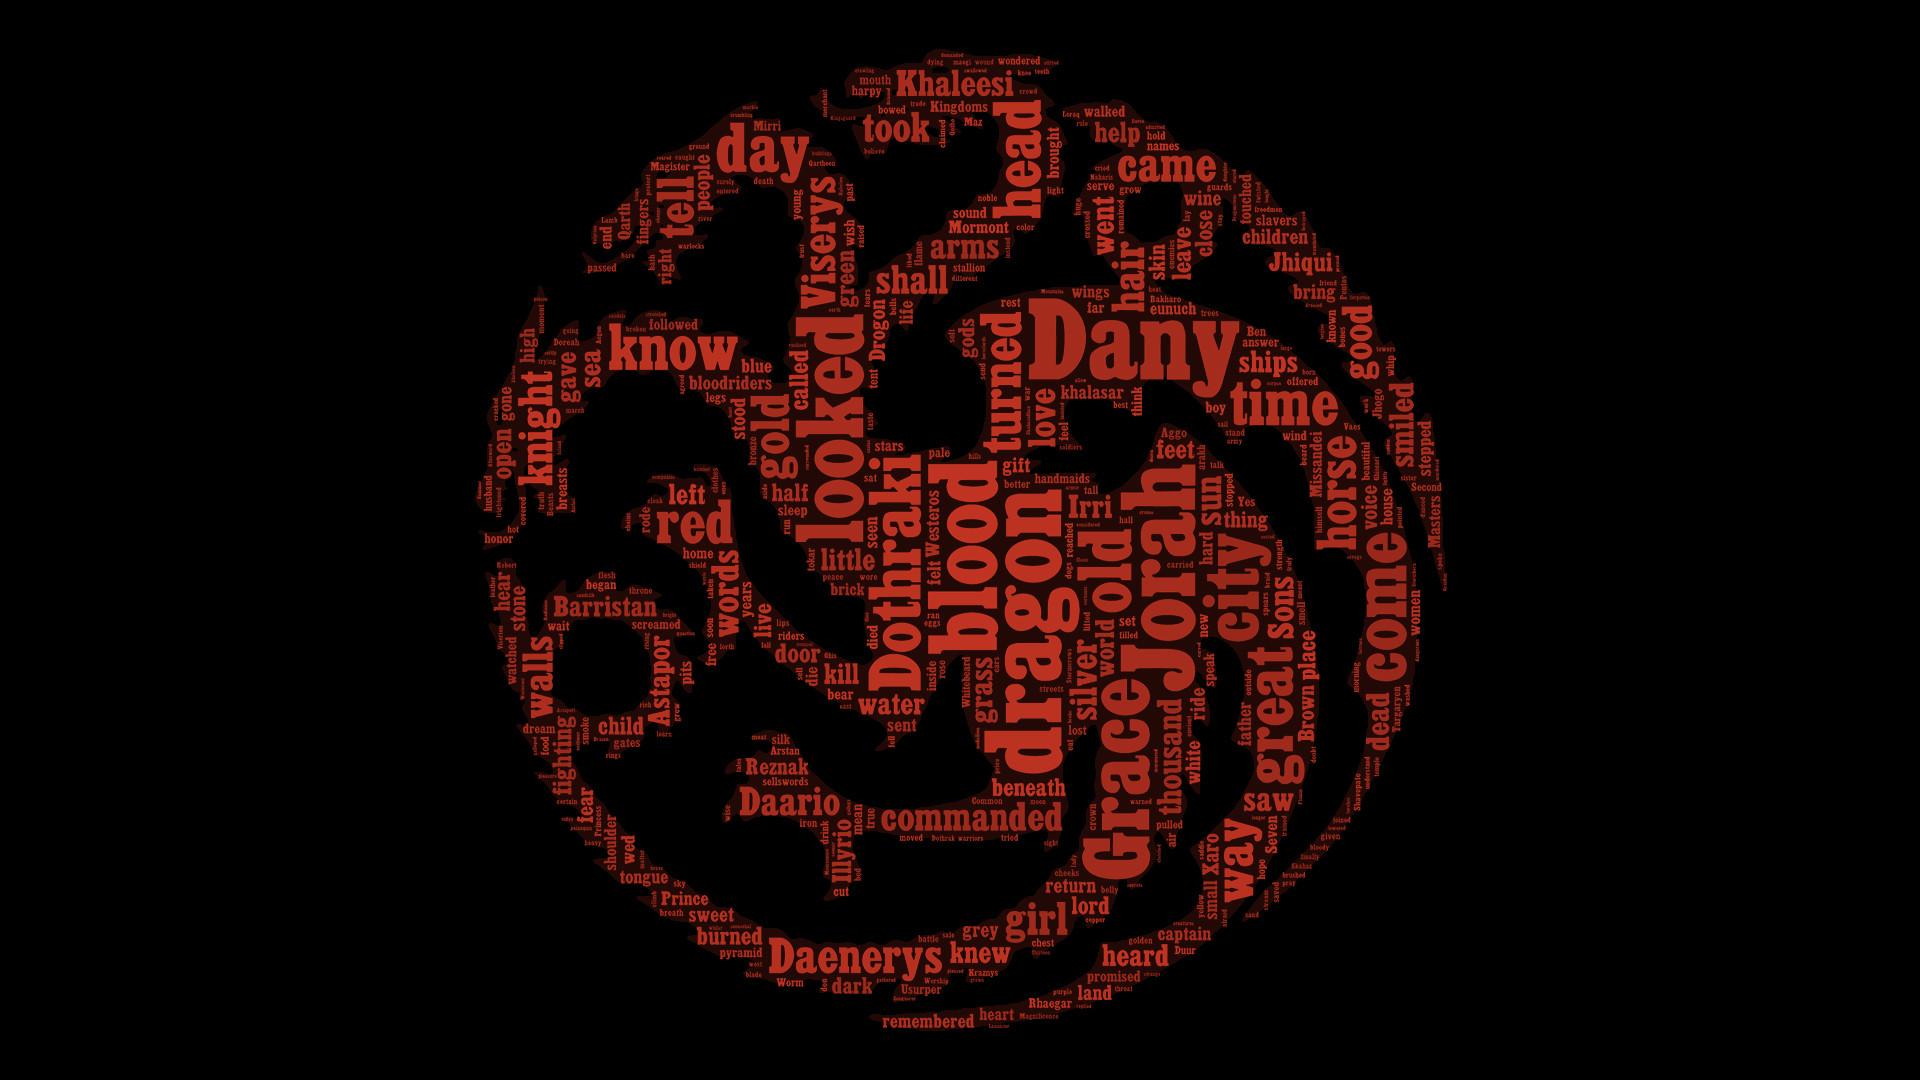 … ASOIAF Word Cloud – Daenerys Targaryen by galanix